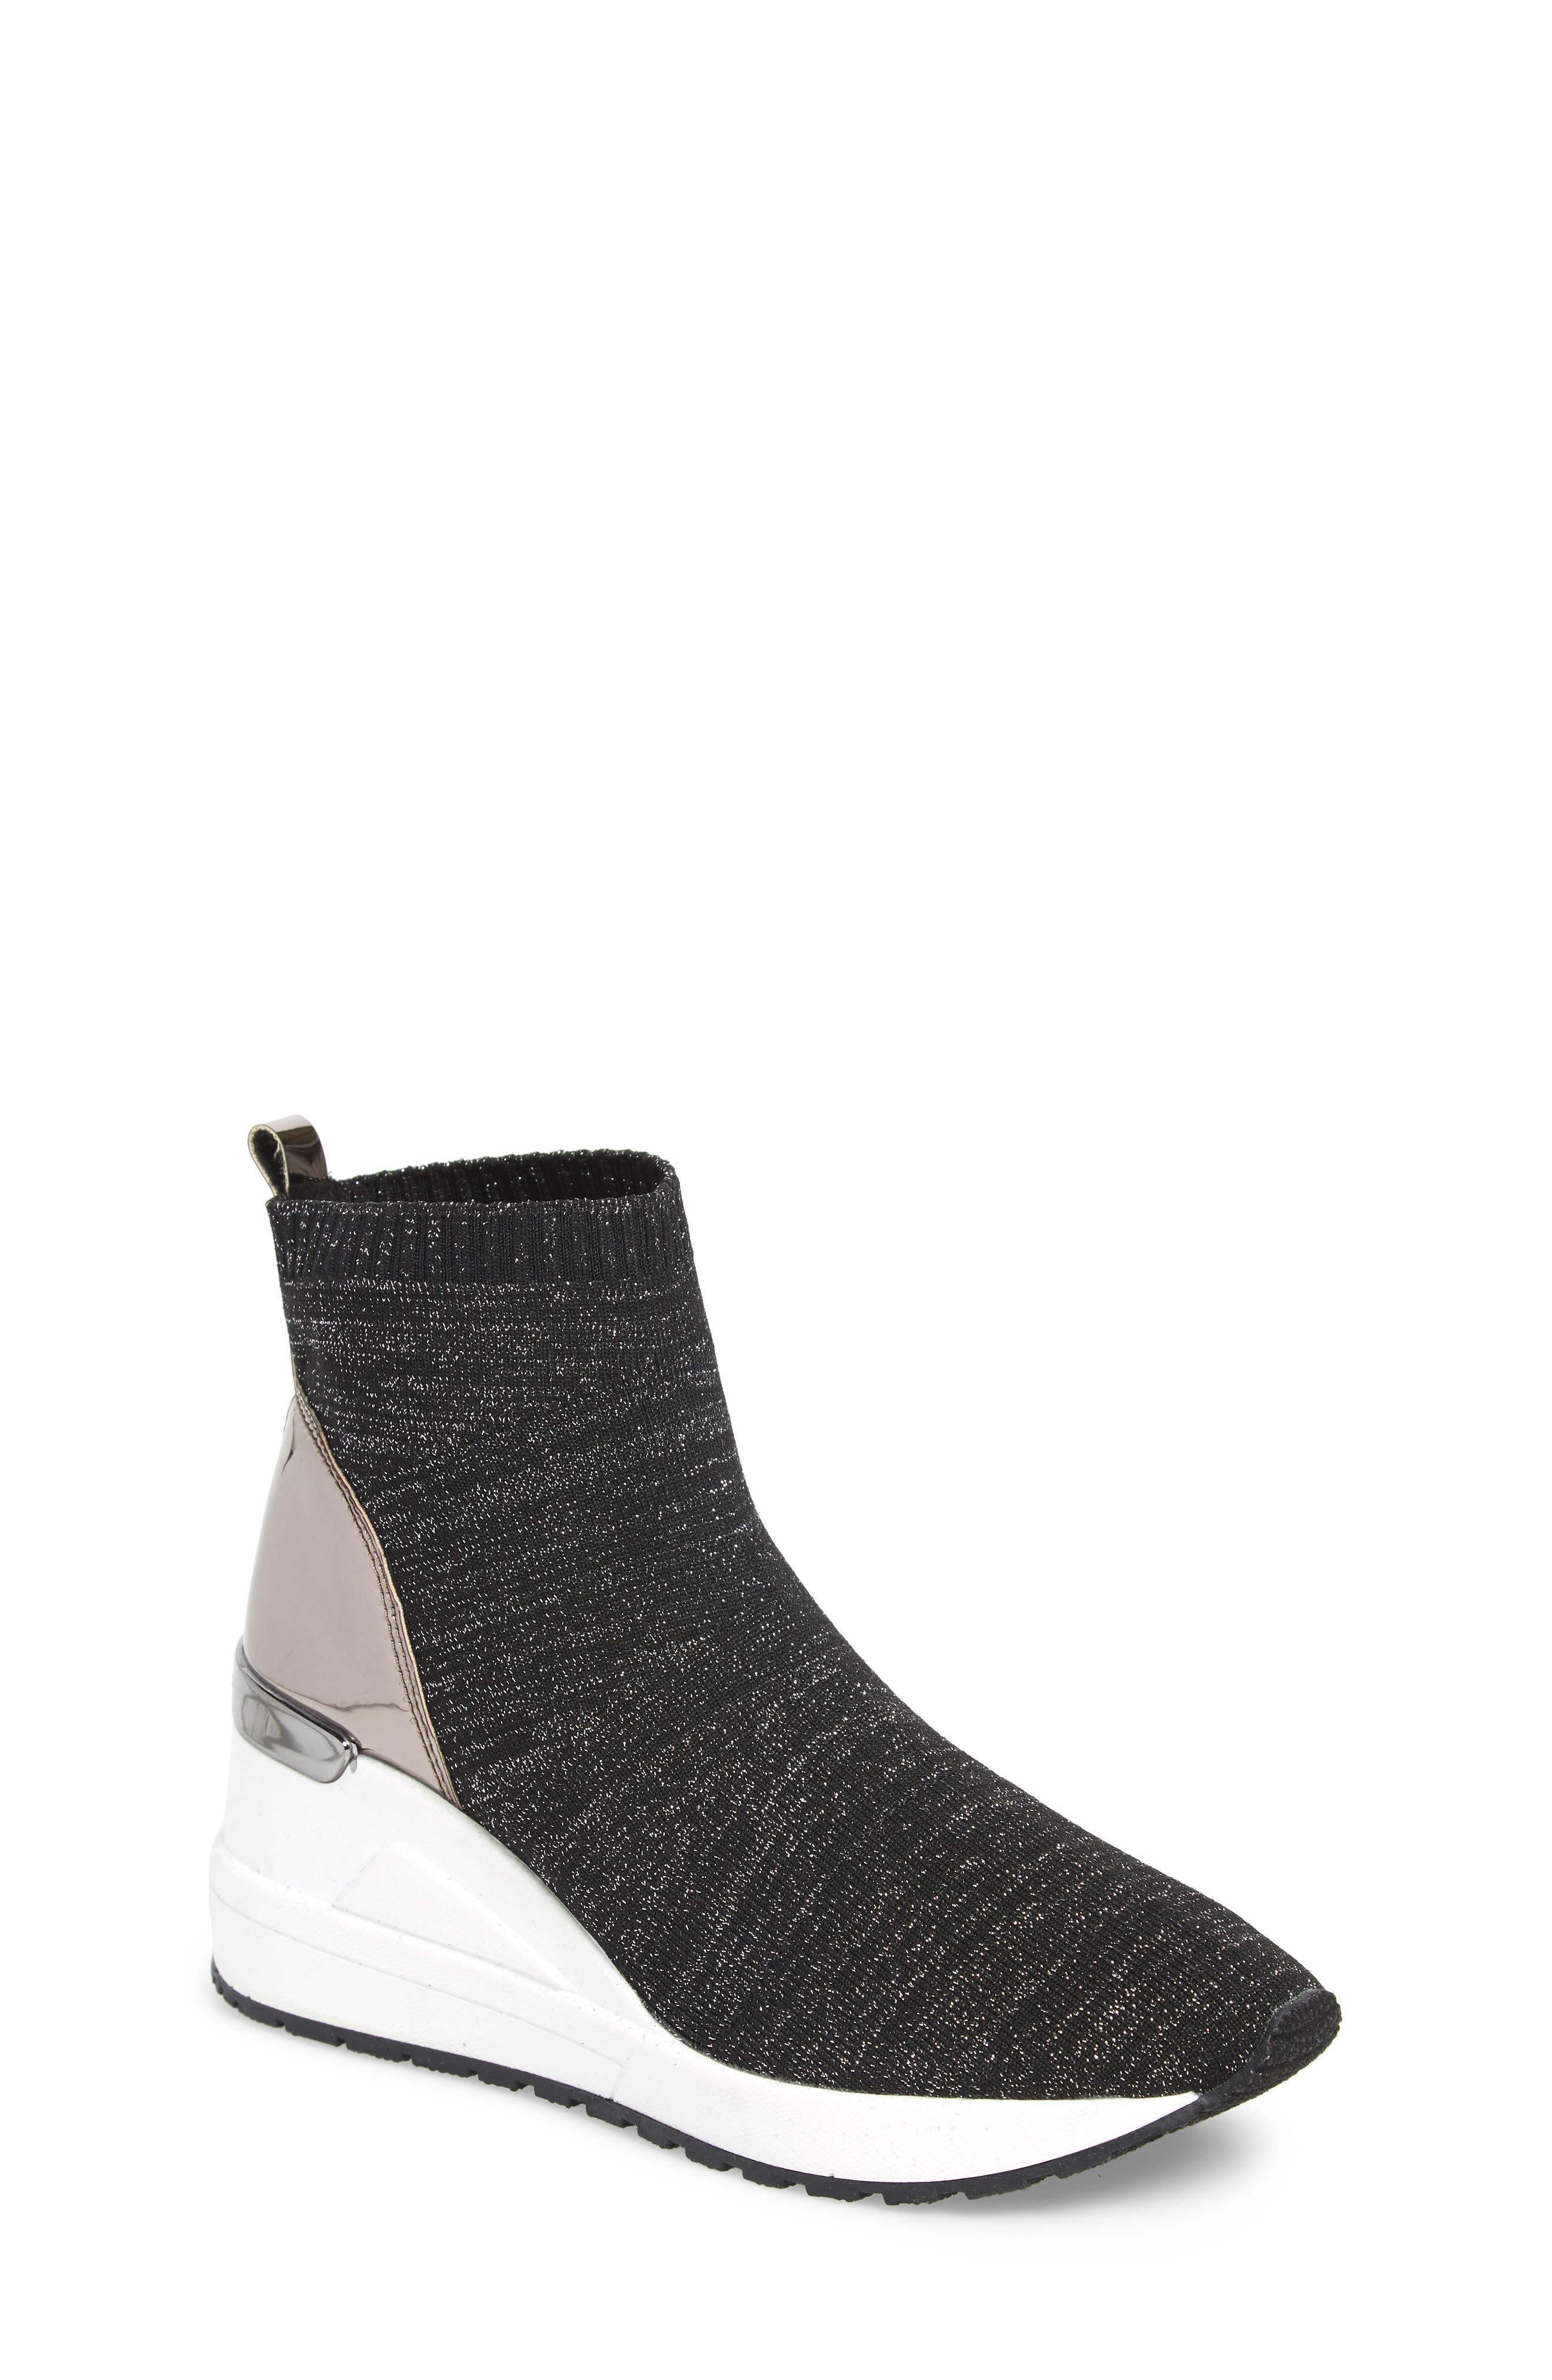 MICHAEL MICHAEL KORS, Neo Flex Metallic Wedge Sneaker, Main thumbnail 1, color, BLACK METALLIC